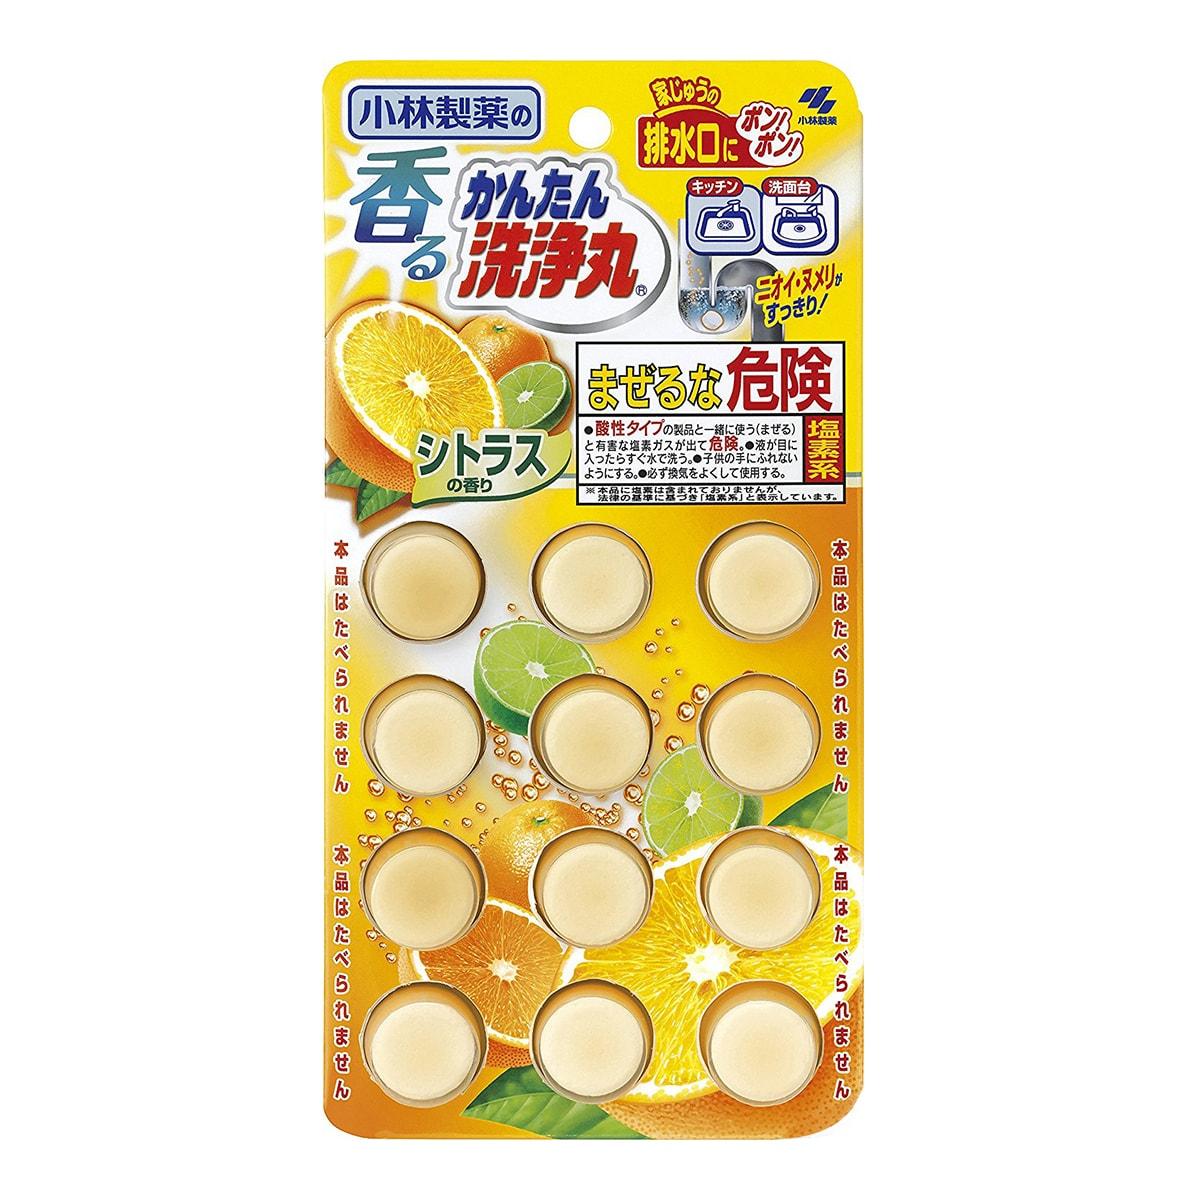 KOBAYASHI Multi Purpose Easy Cleaning Scented Cleaner Orange 12 Tablets